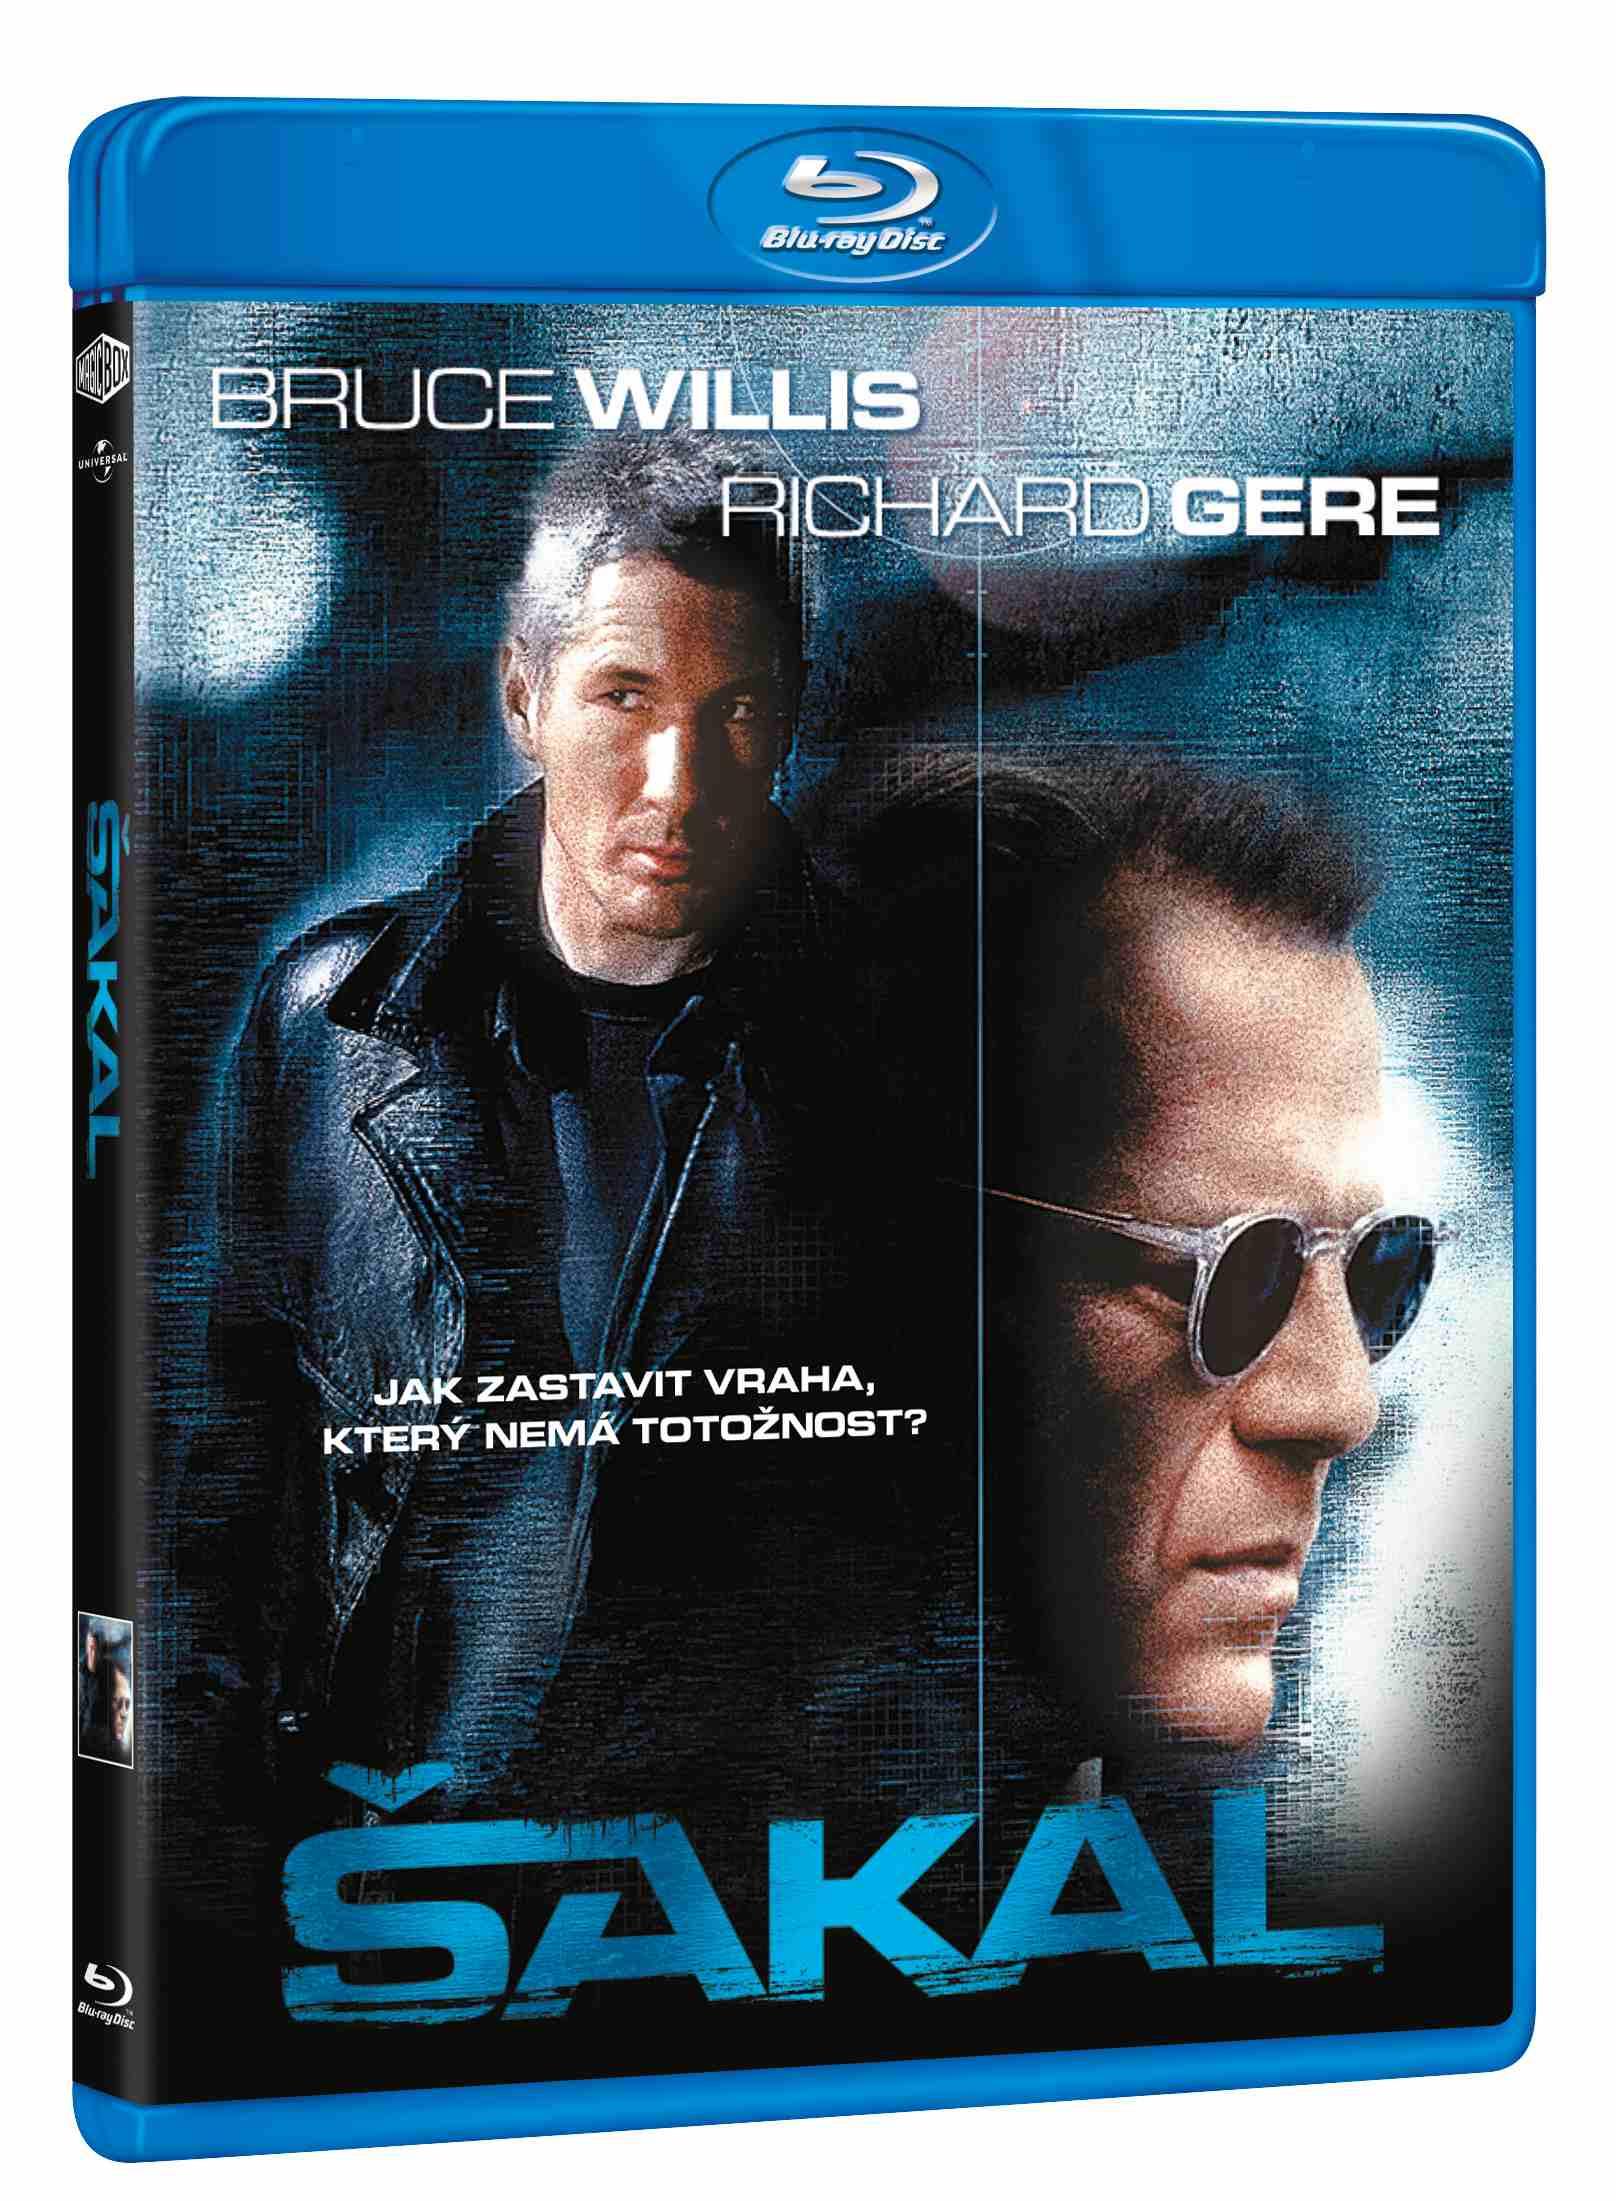 ŠAKAL - Blu-ray